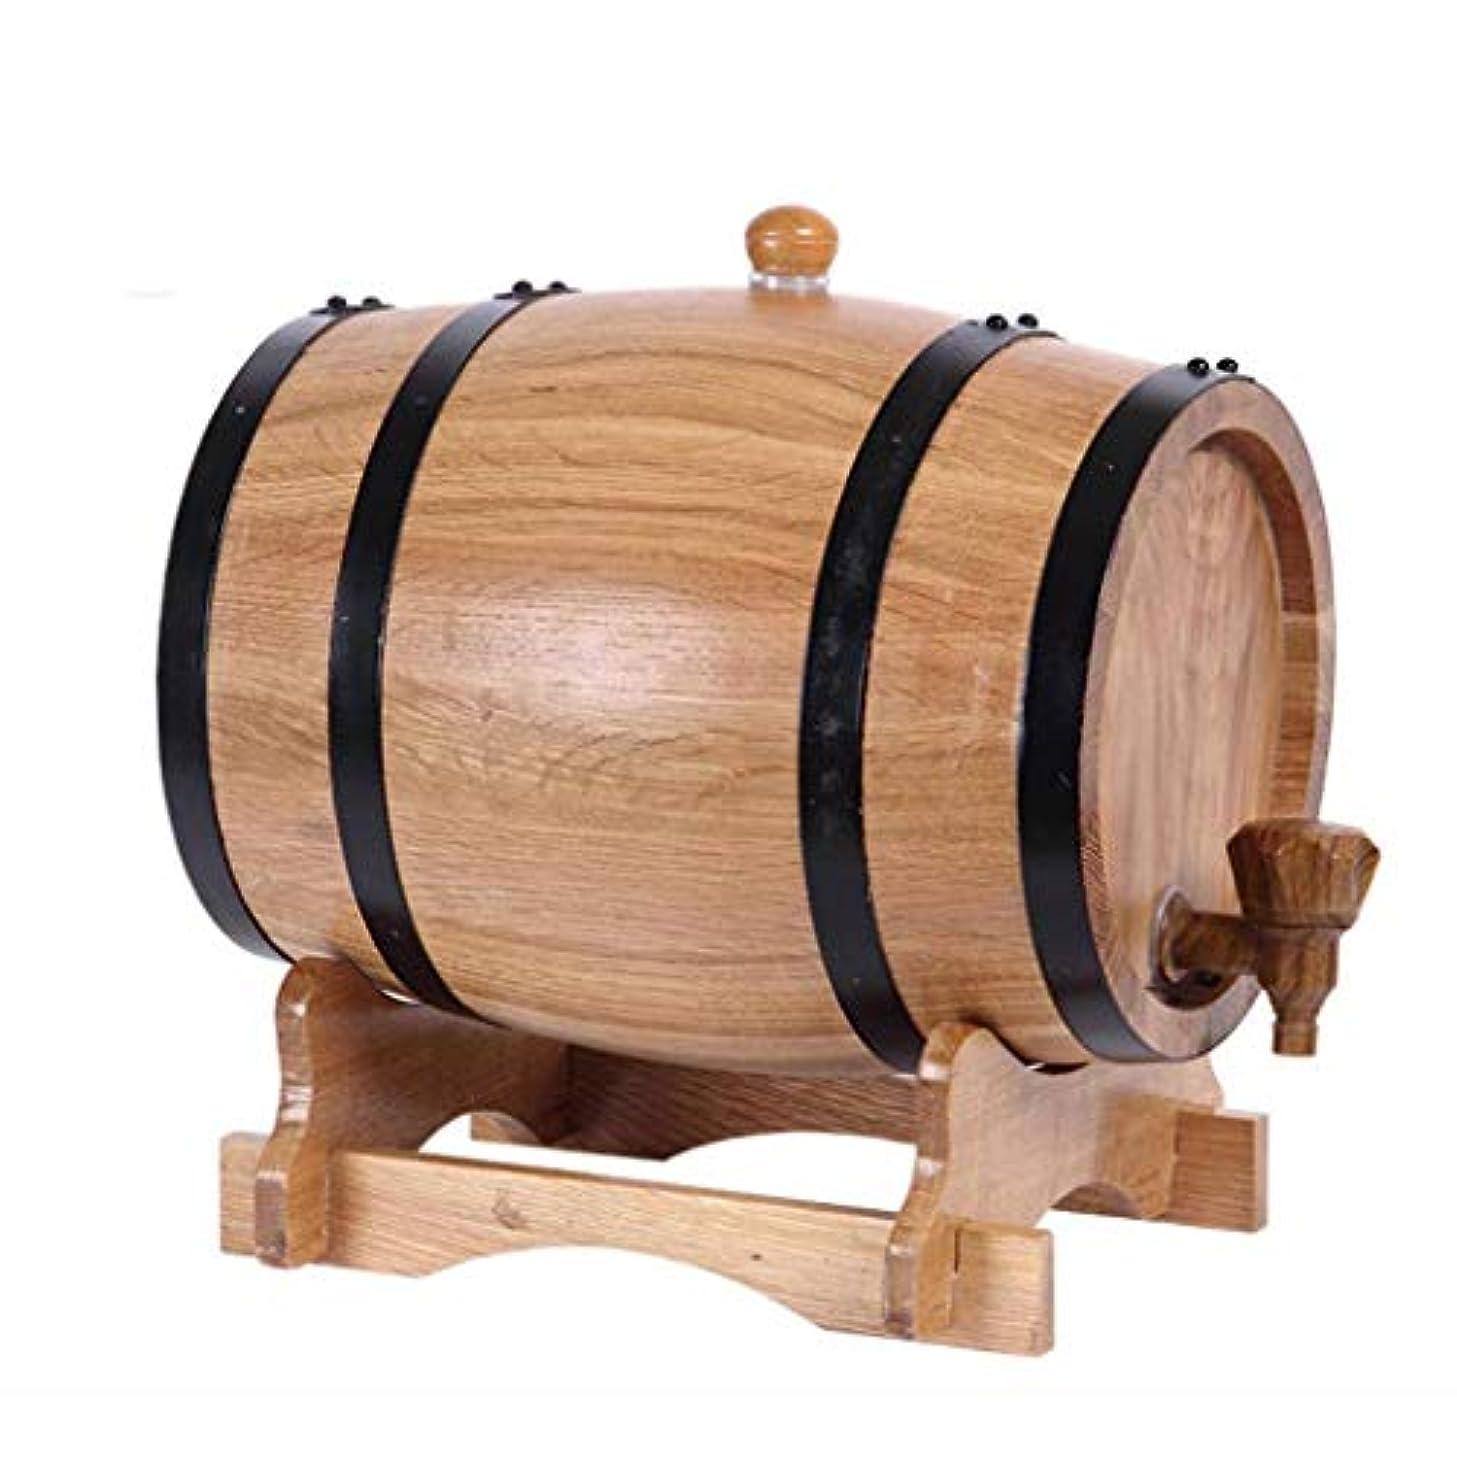 G.CHEN Oak Aging Whiskey Barrel, Vintage Wood Oak Timber Wine Barrel Dispenser, Handcrafted Using White Oak, Suitable for Whiskey/Wine/Tequila/Rum (10 Liter)